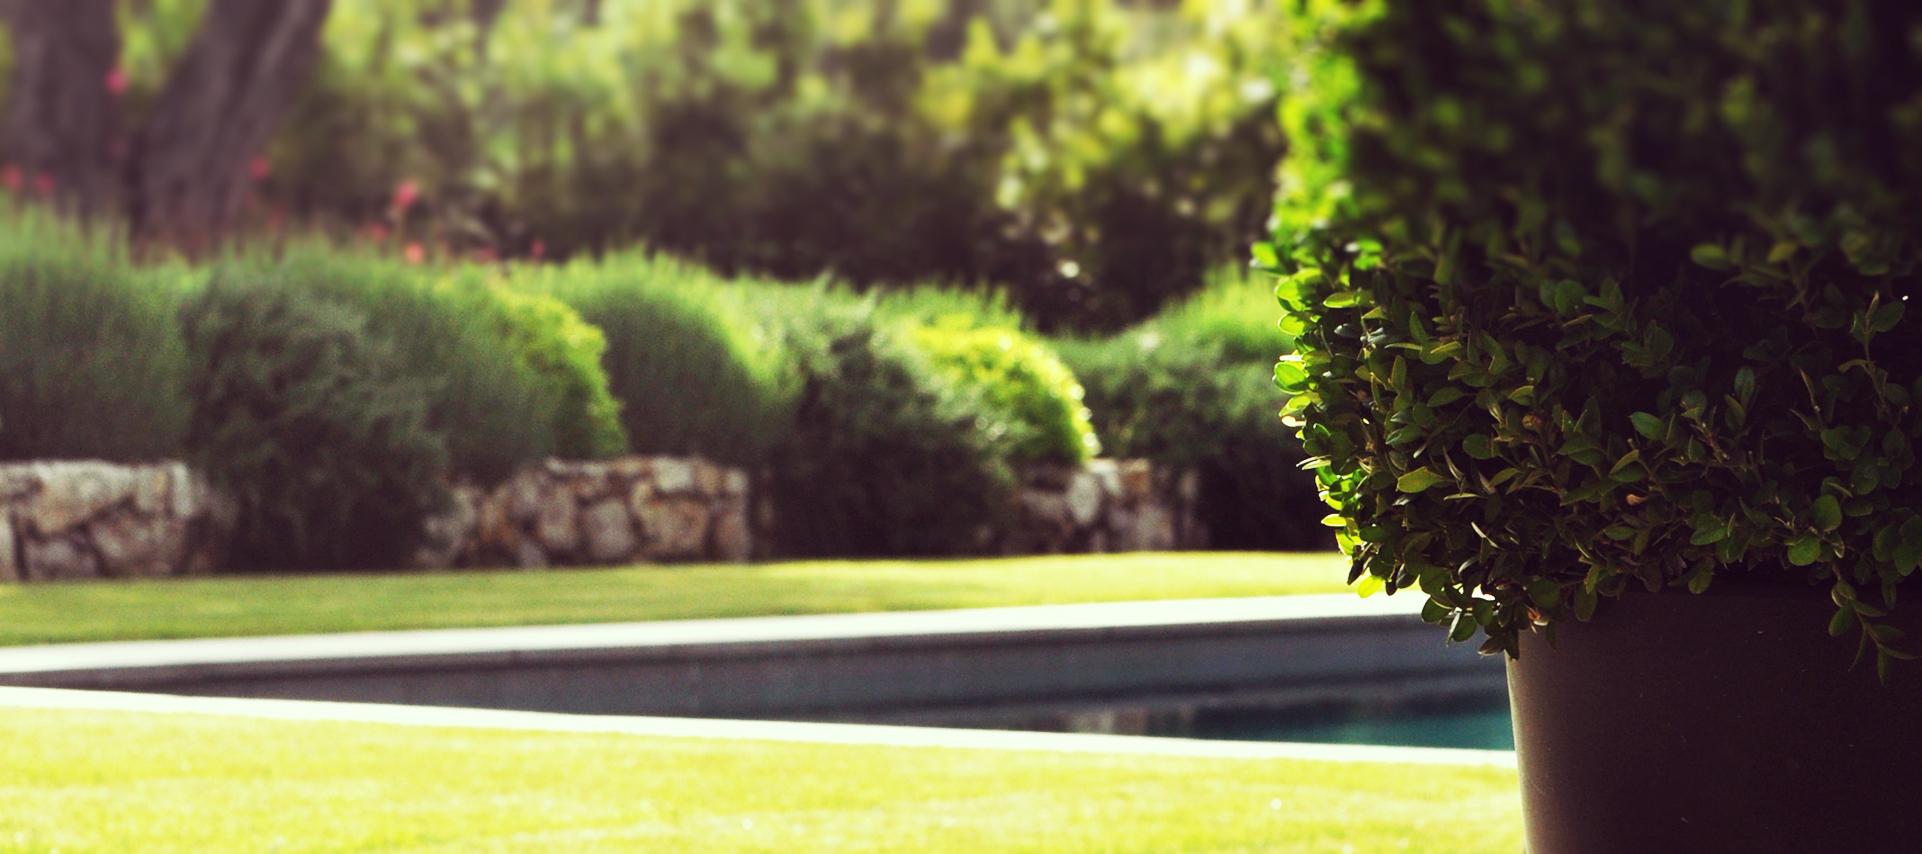 Entretien parcs et jardins adonis paysages for Entretien jardin emploi